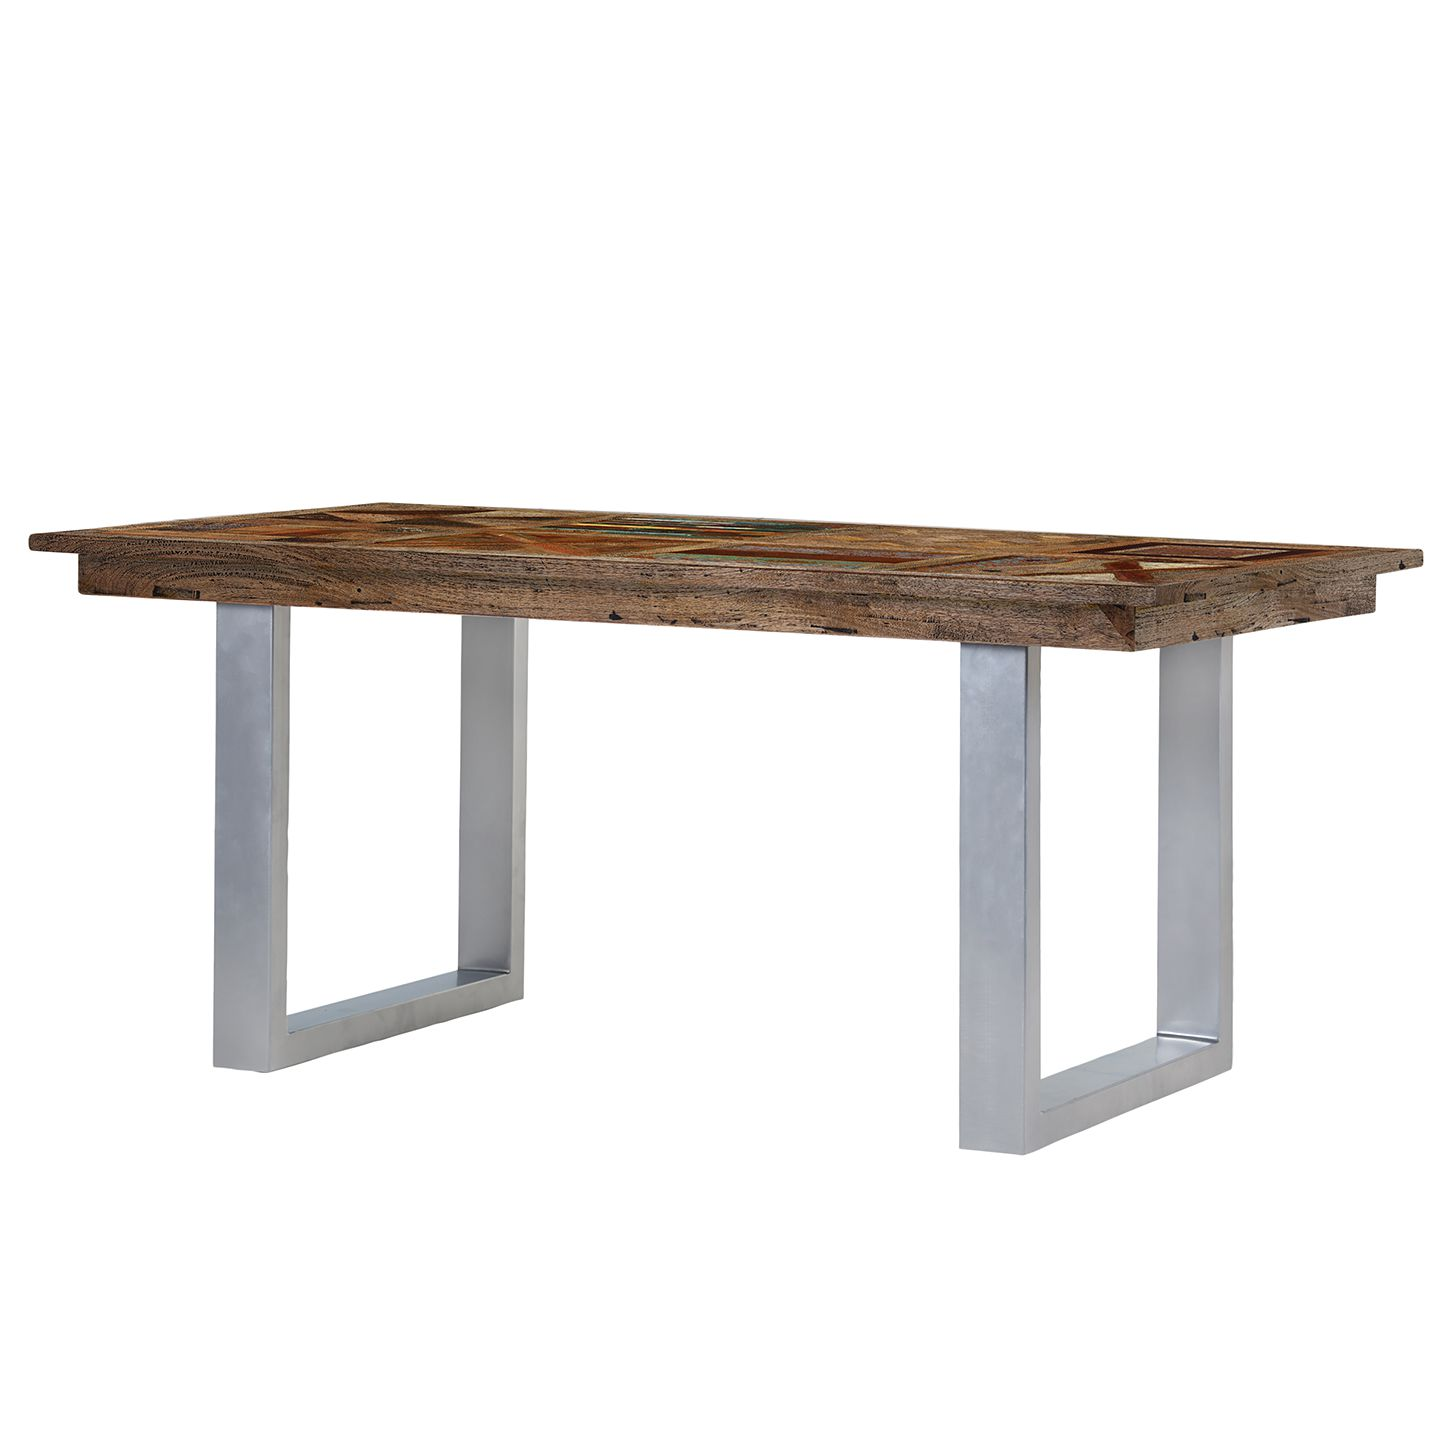 Table à manger Camibar IV - Manguier massif / Métal - Manguier / Argenté, Ars Natura